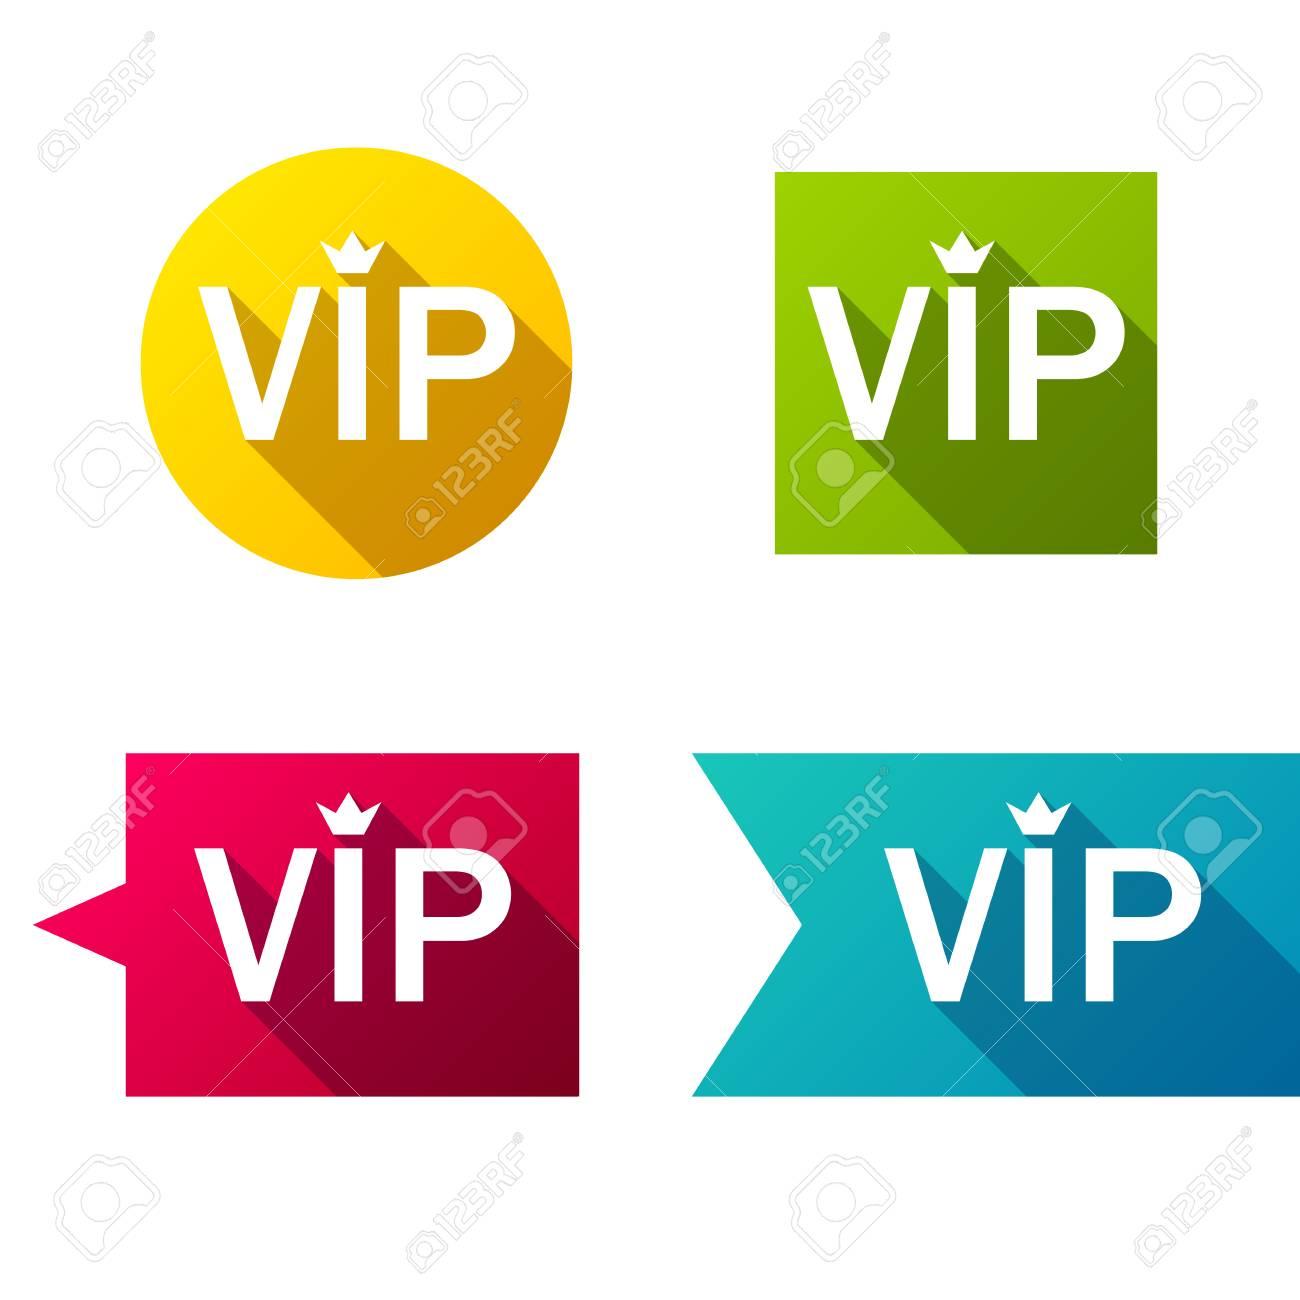 colorful vip badges labesl set simple flat style design royalty